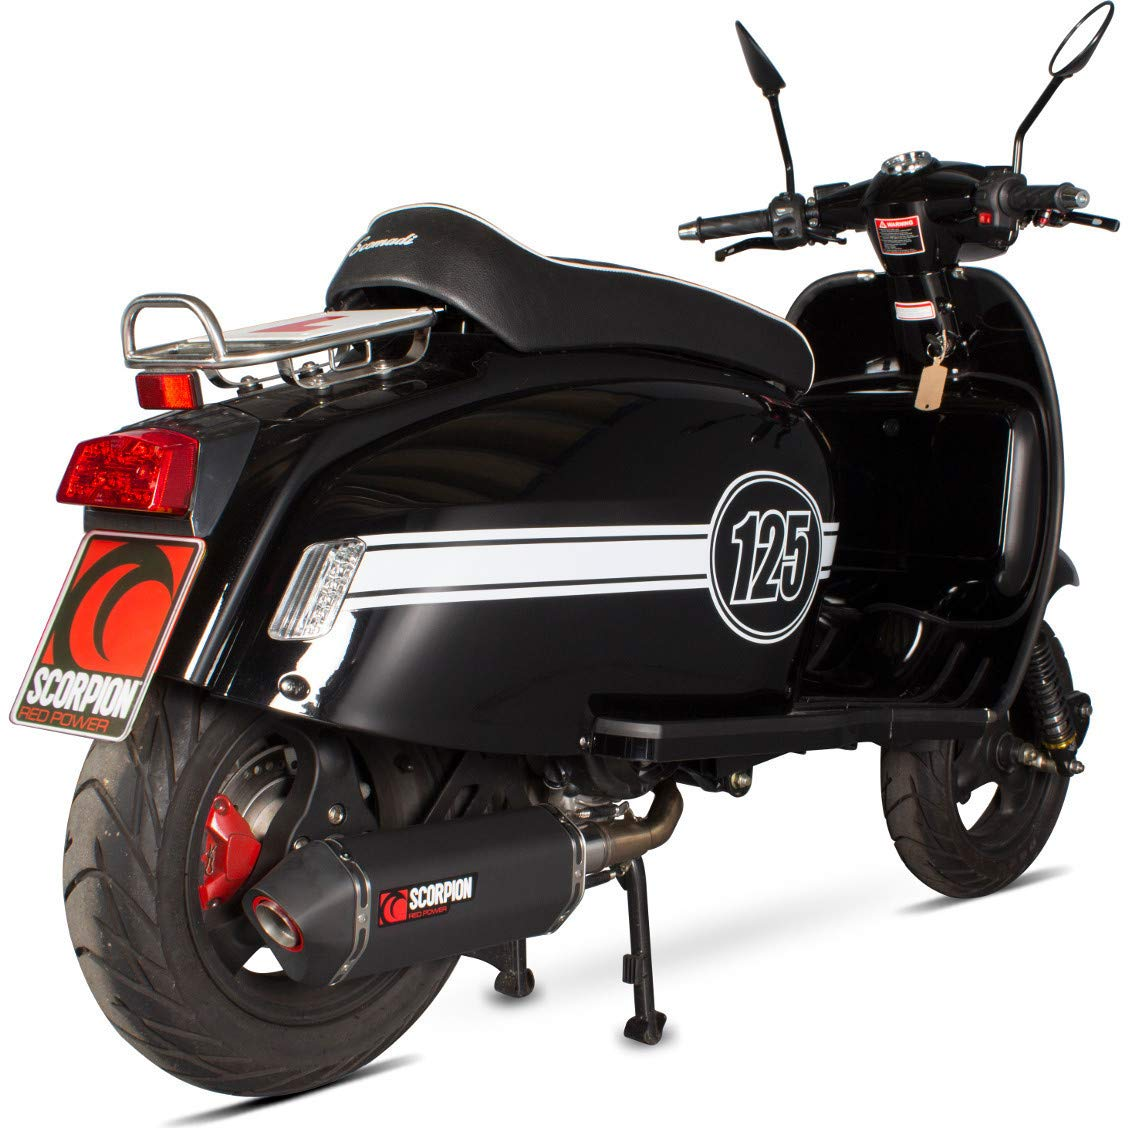 Scomadi TL125 Serket Full System Black Ceramic Coated Exhaust sleeve